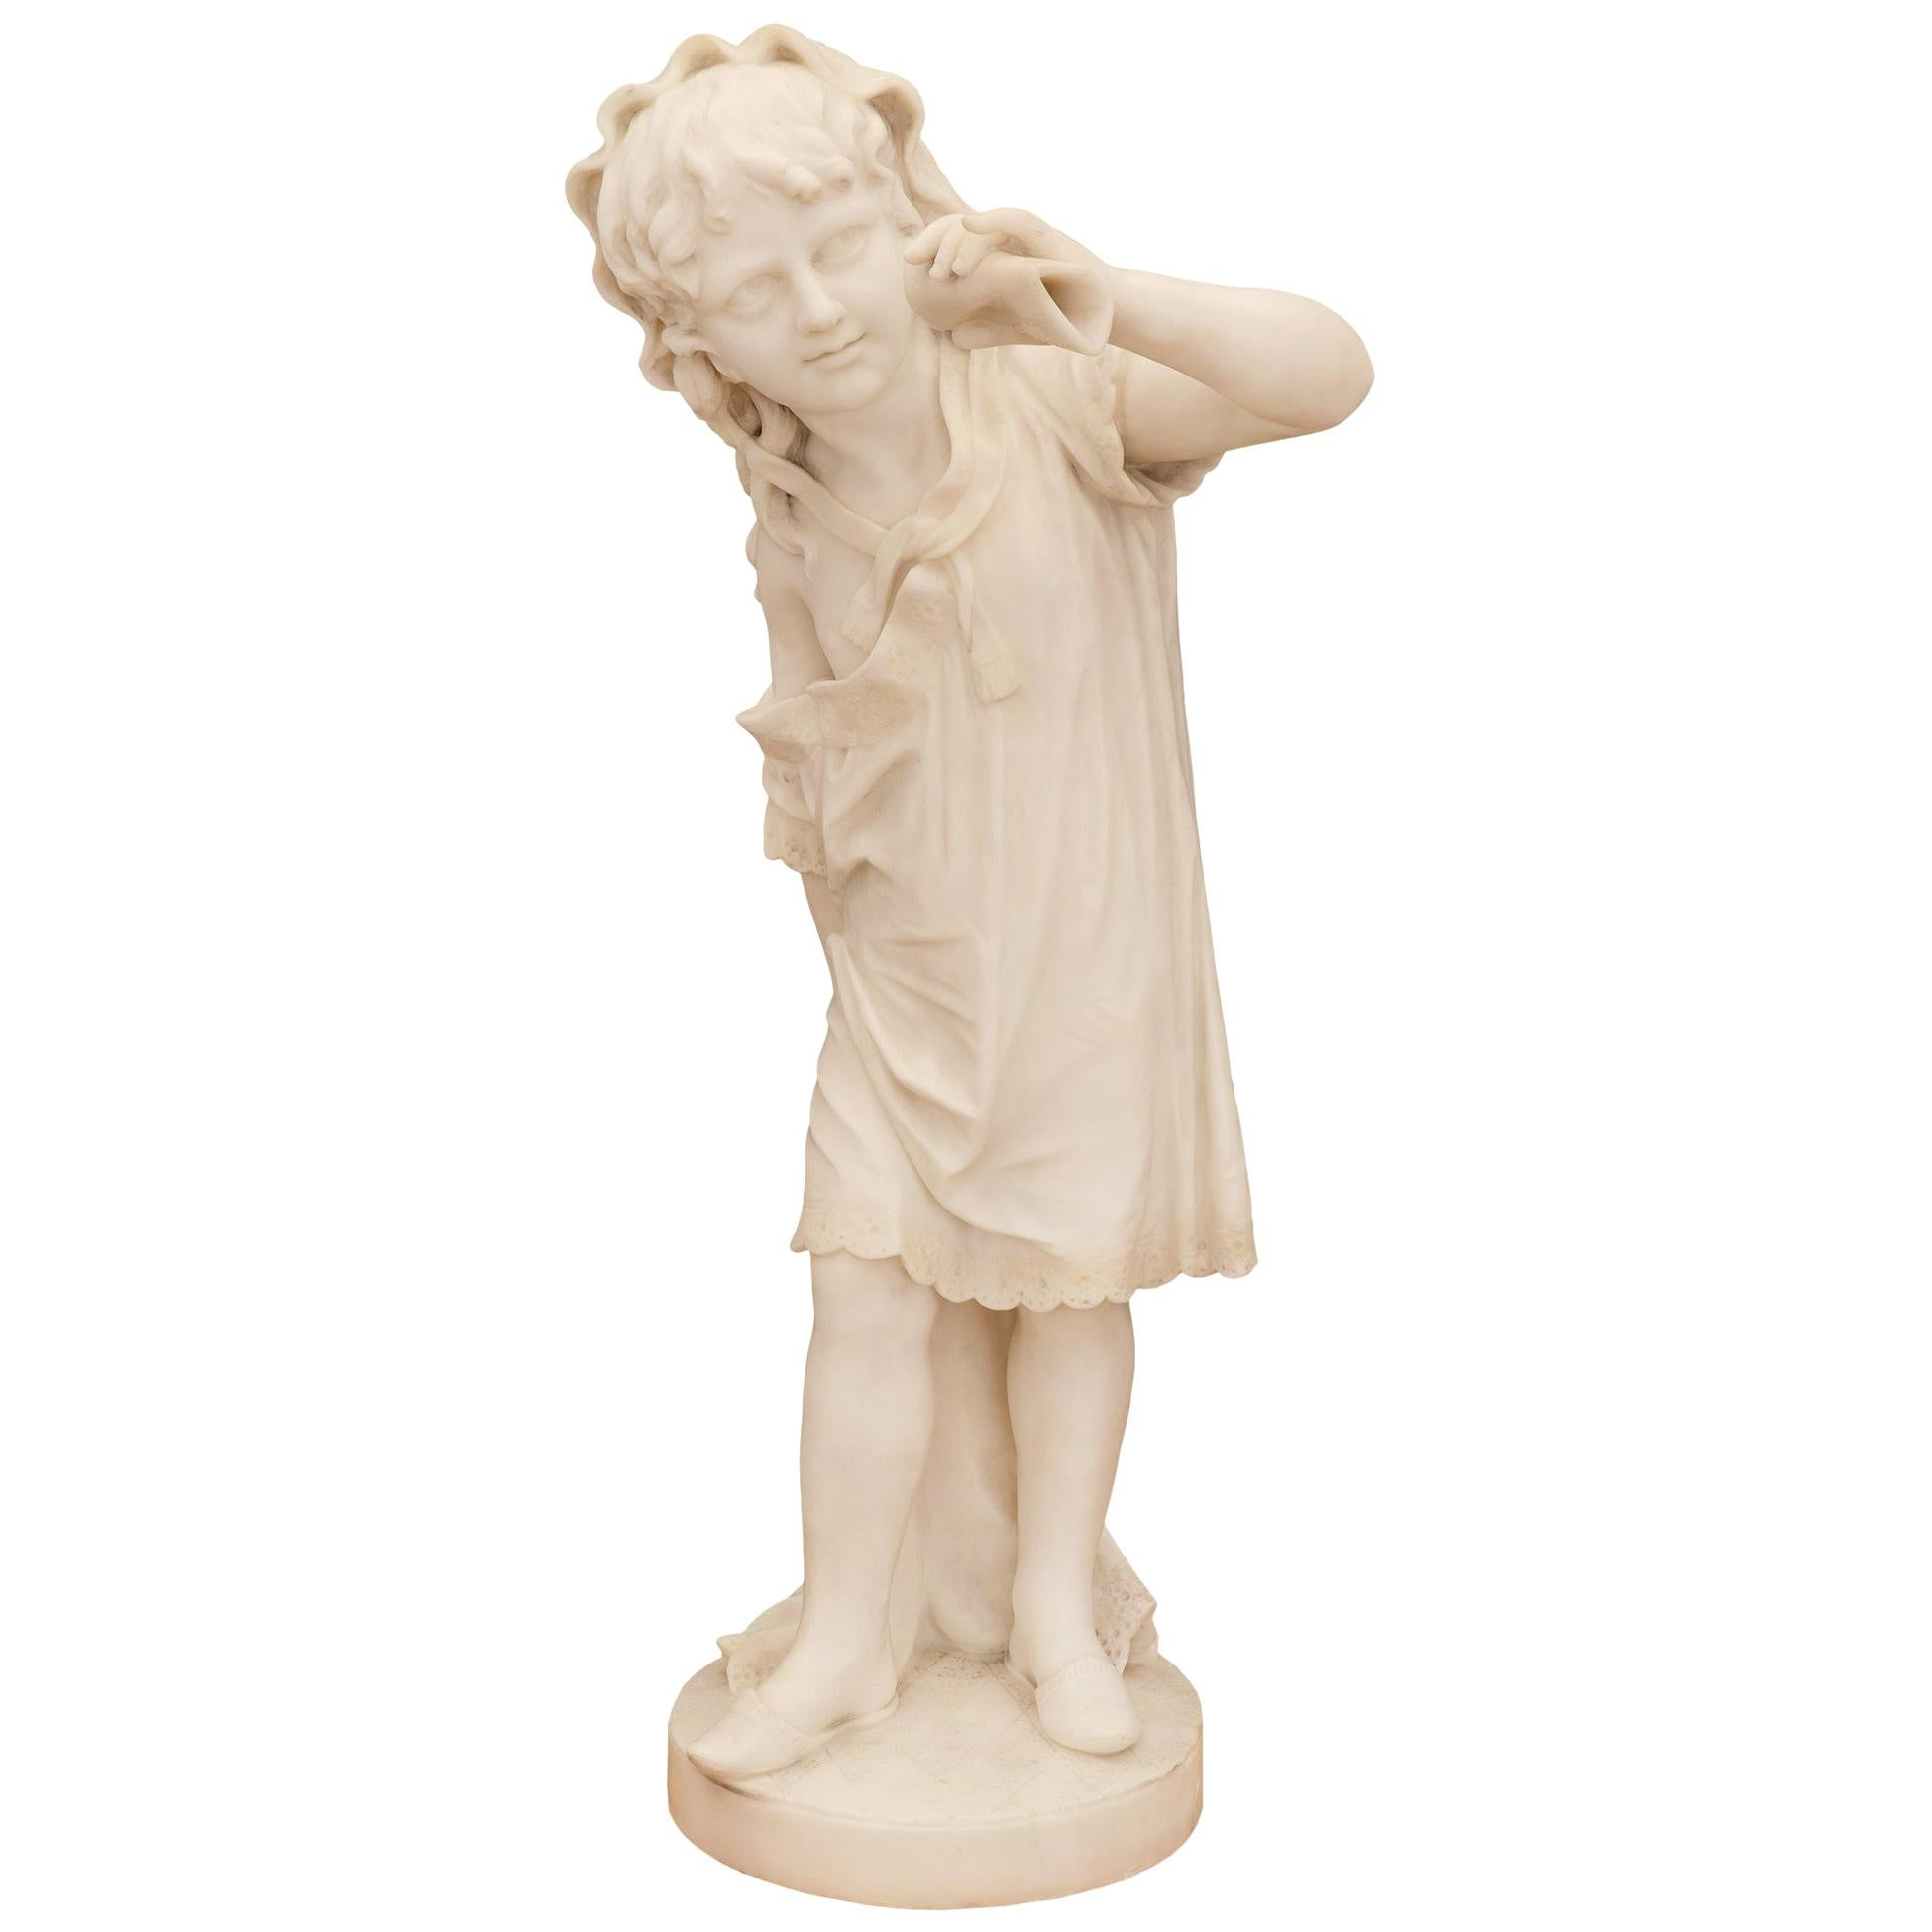 Italian 19th Century White Carrara Marble Statue